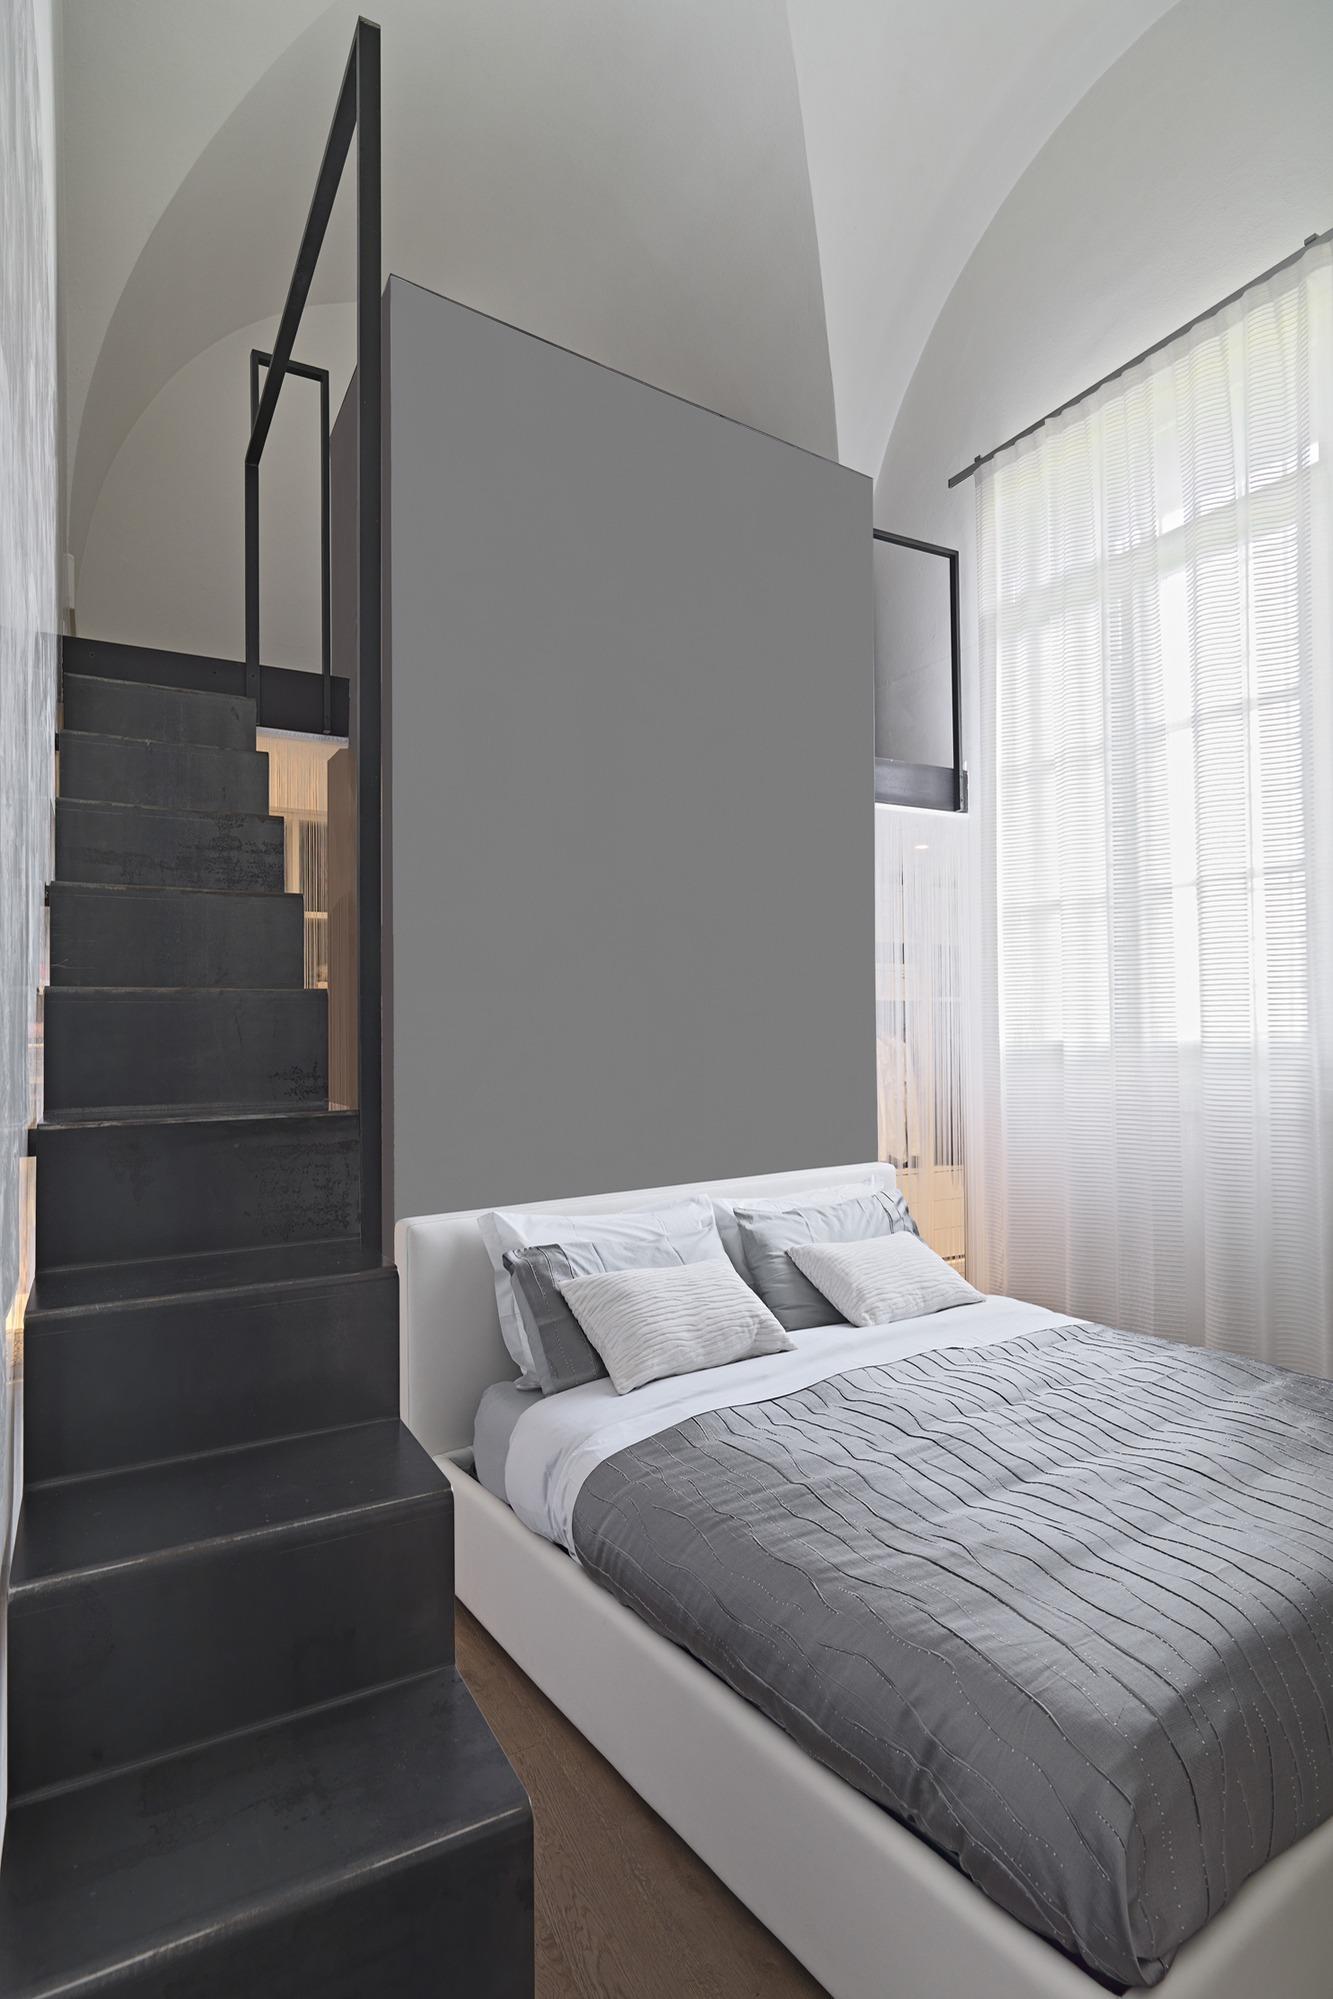 Mezzanine flooring birmingham increase your floor space by 100 - Bed mezzanie kind ...